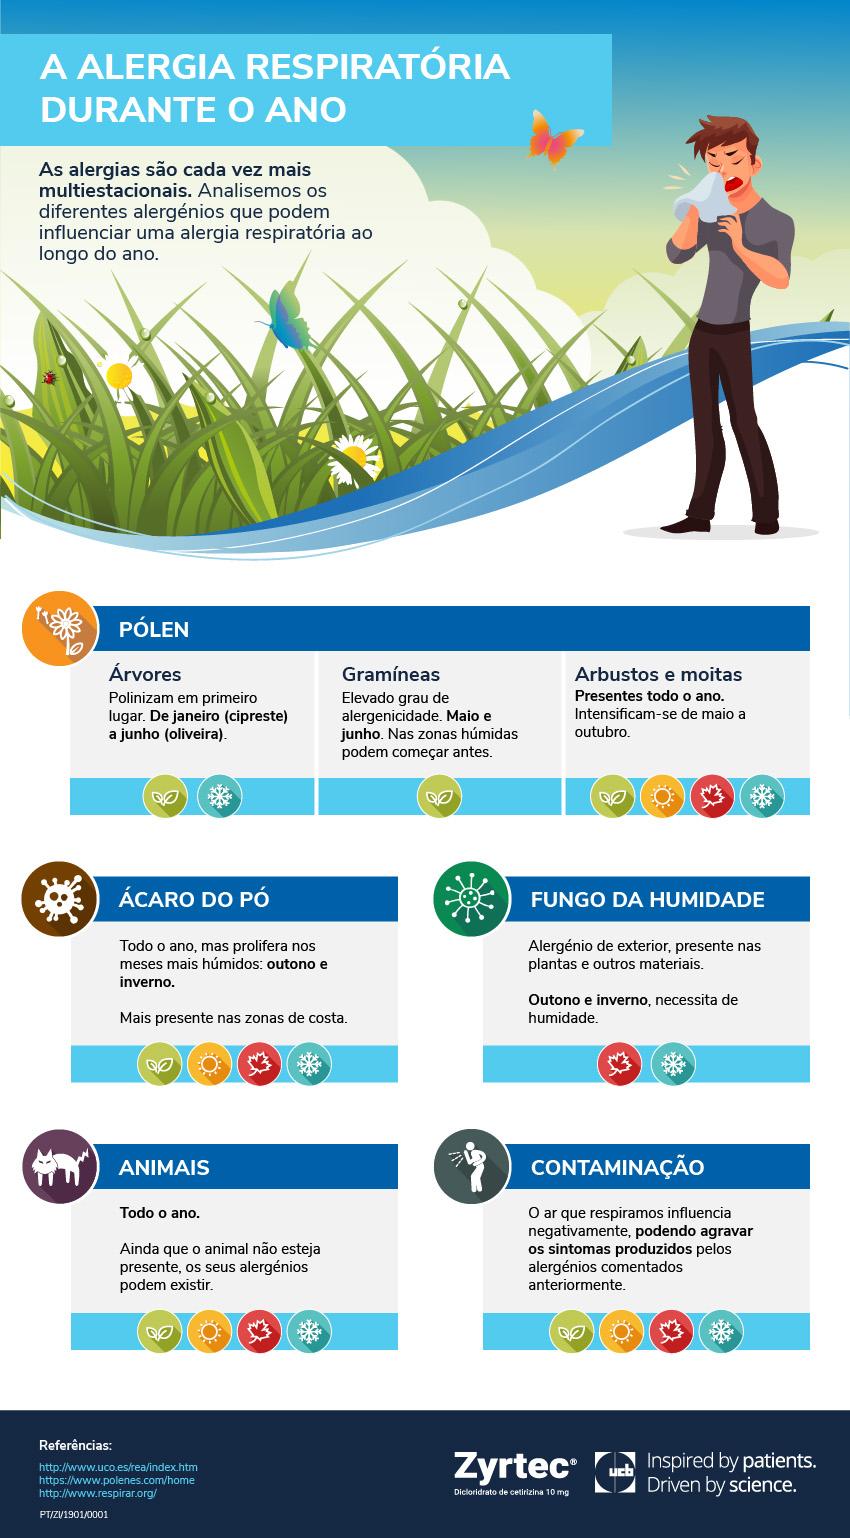 Alergia respiratoria durante o ano